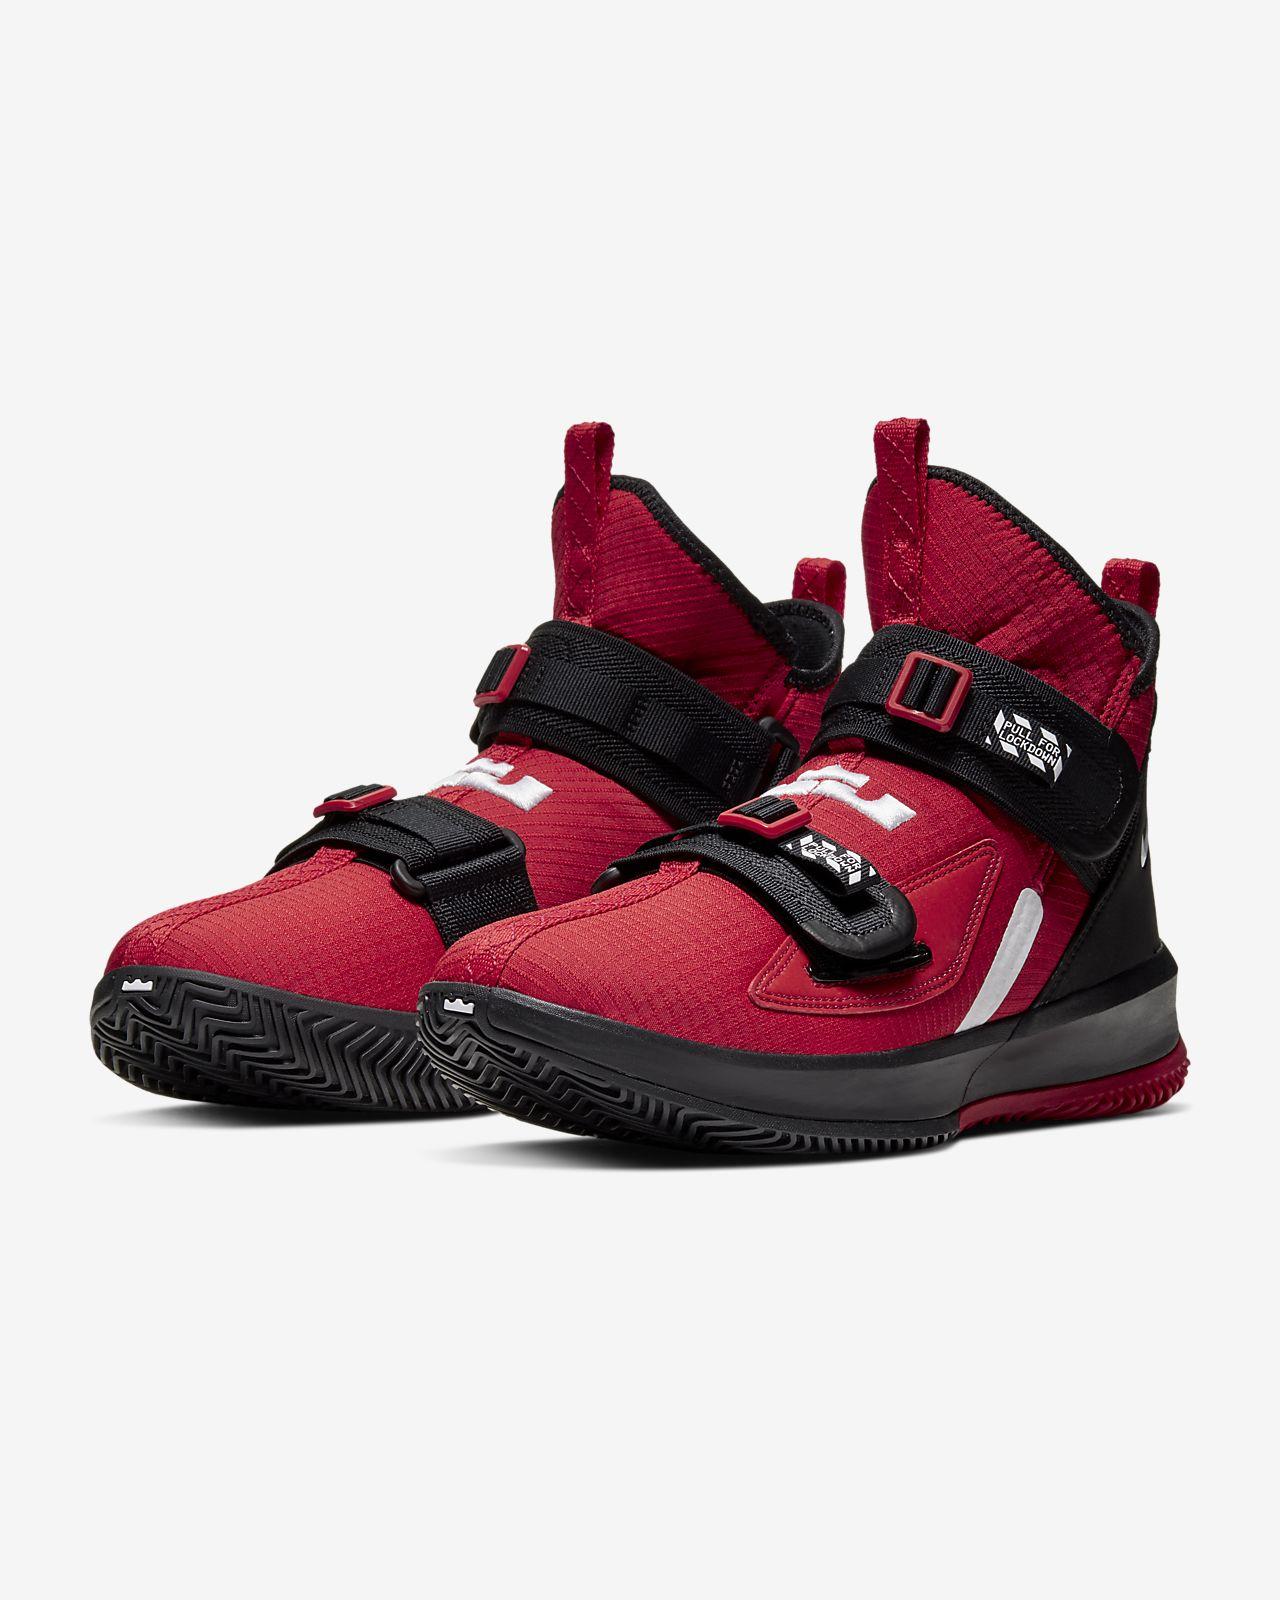 lebron soldier 13 sfg basketball shoe. nike